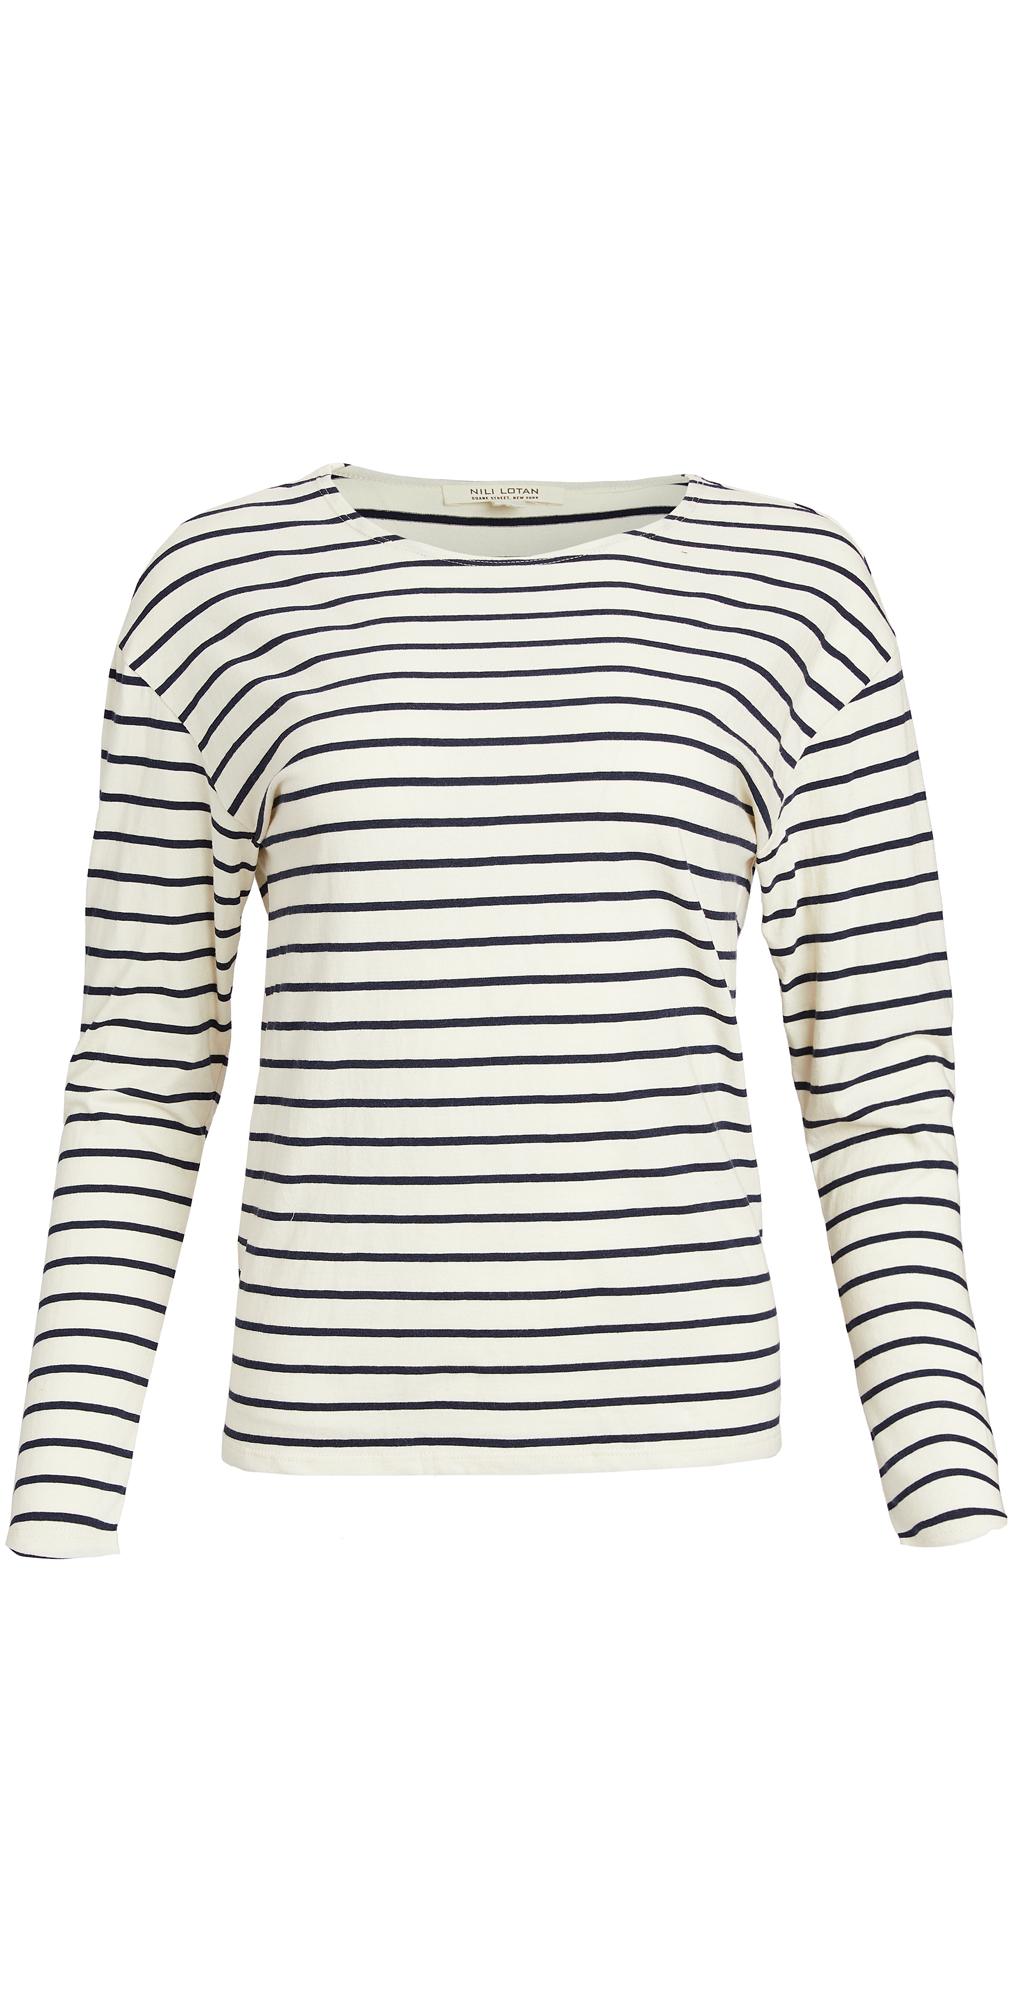 Nili Lotan Arlette Long Sleeve Shirt